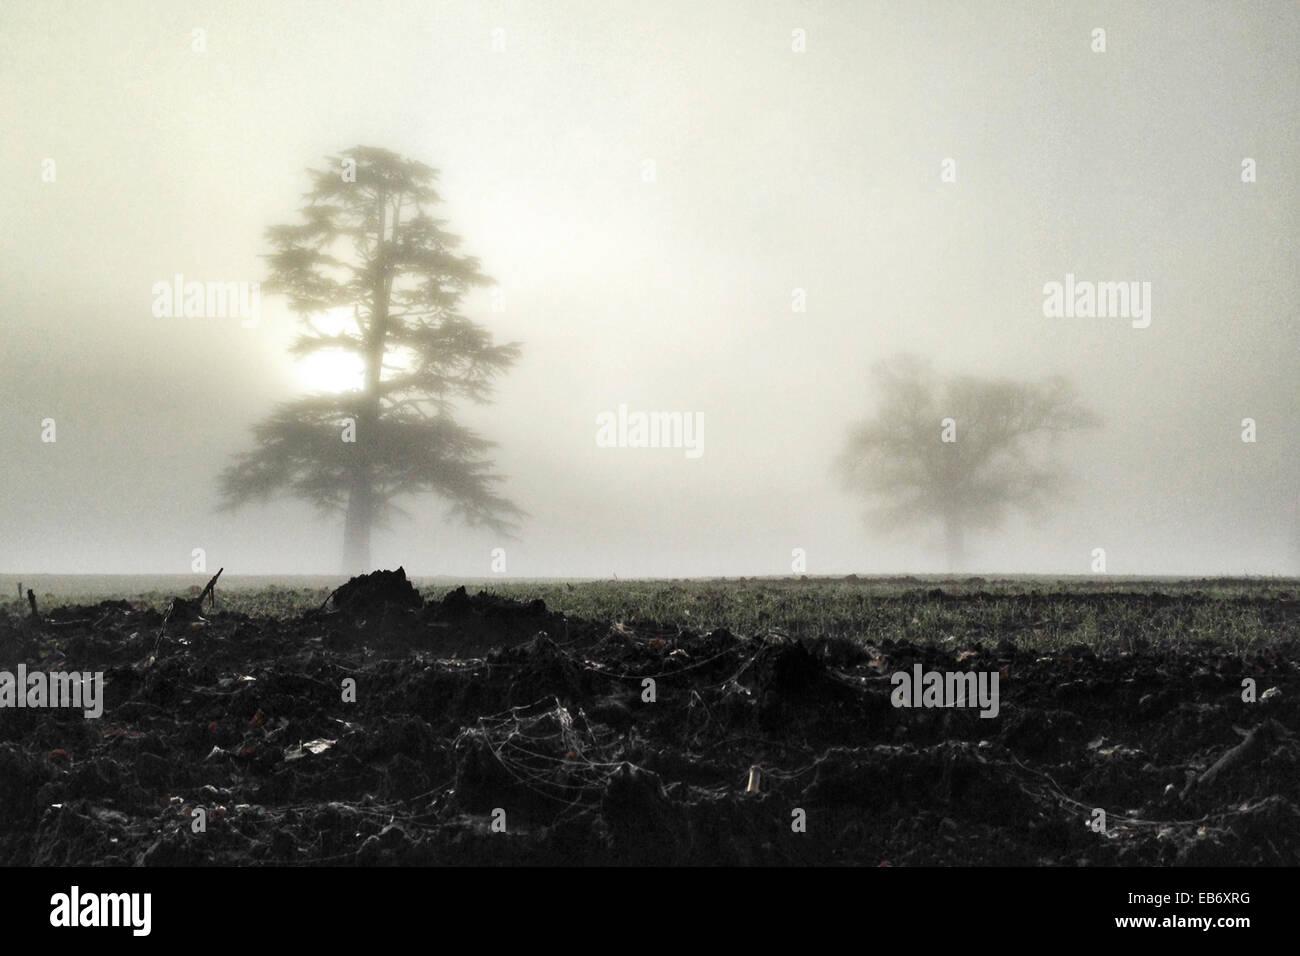 Dunchideock, Devon, UK. 27th November, 2014. UK weather. Pockets of thick fog blanket walkers and trees in Dunchideock, - Stock Image